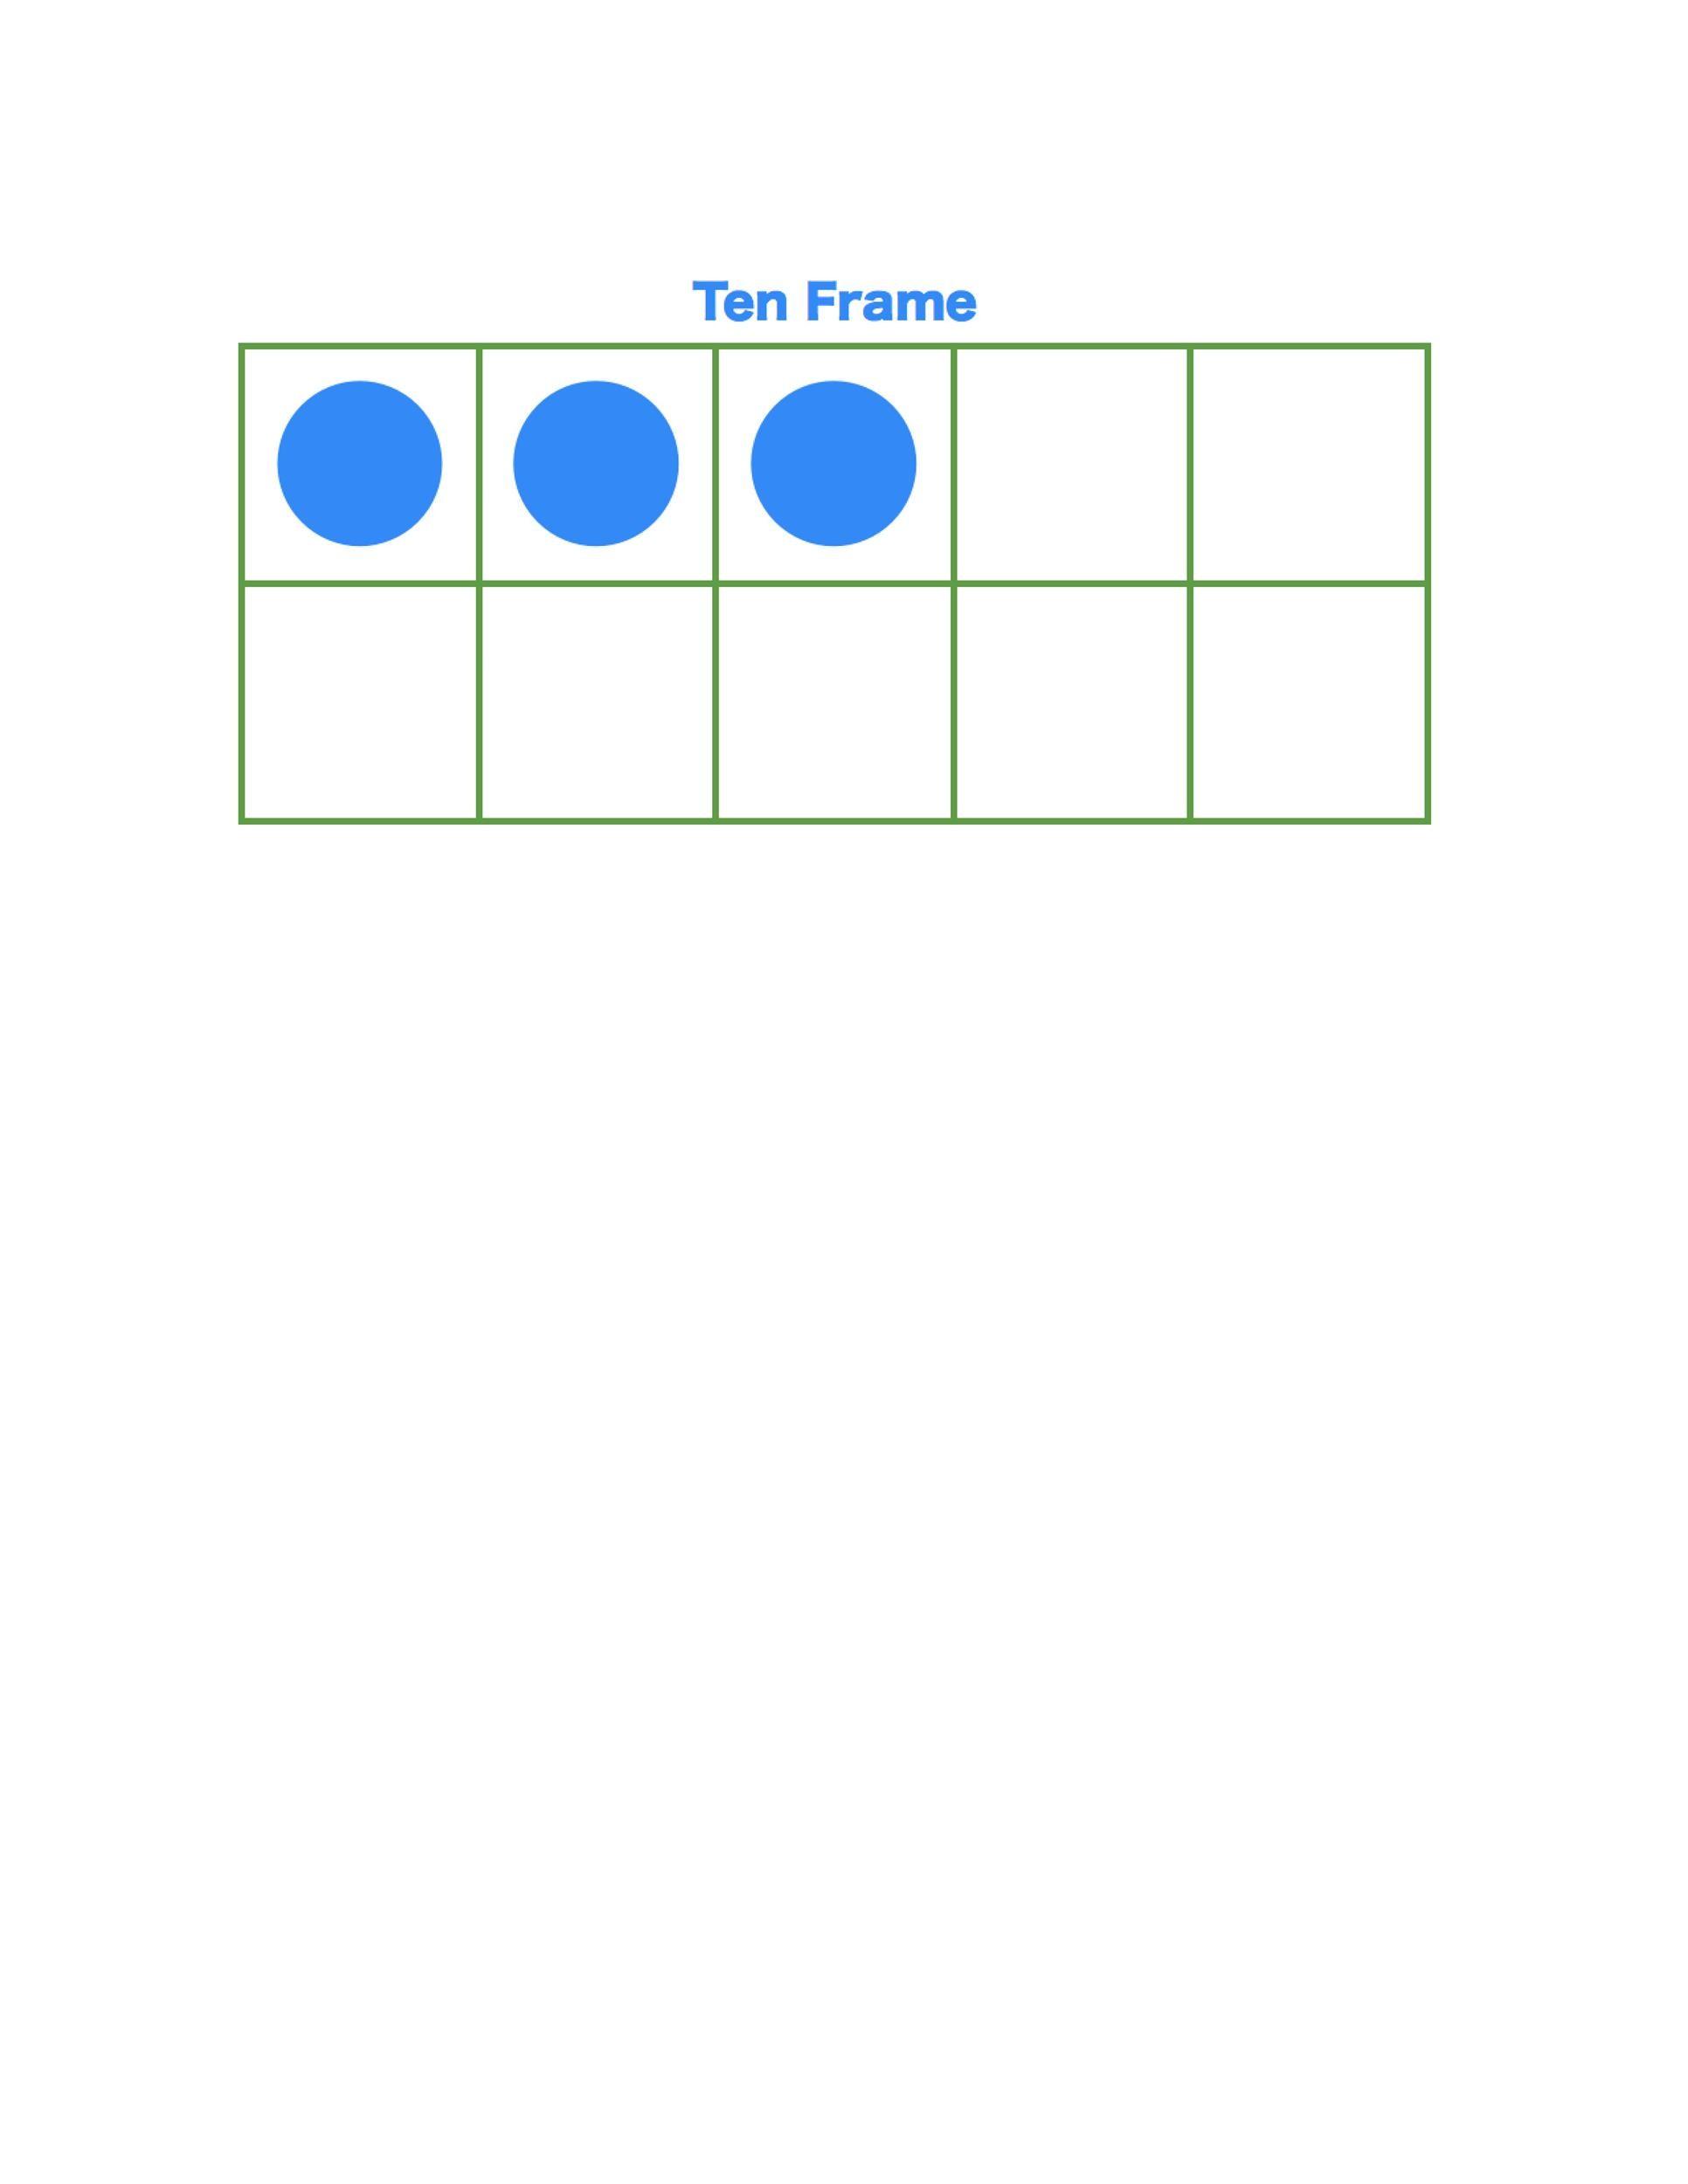 photograph regarding Free Printable Ten Frames identify 36 Printable 10 Body Templates (Cost-free) ᐅ Template Lab